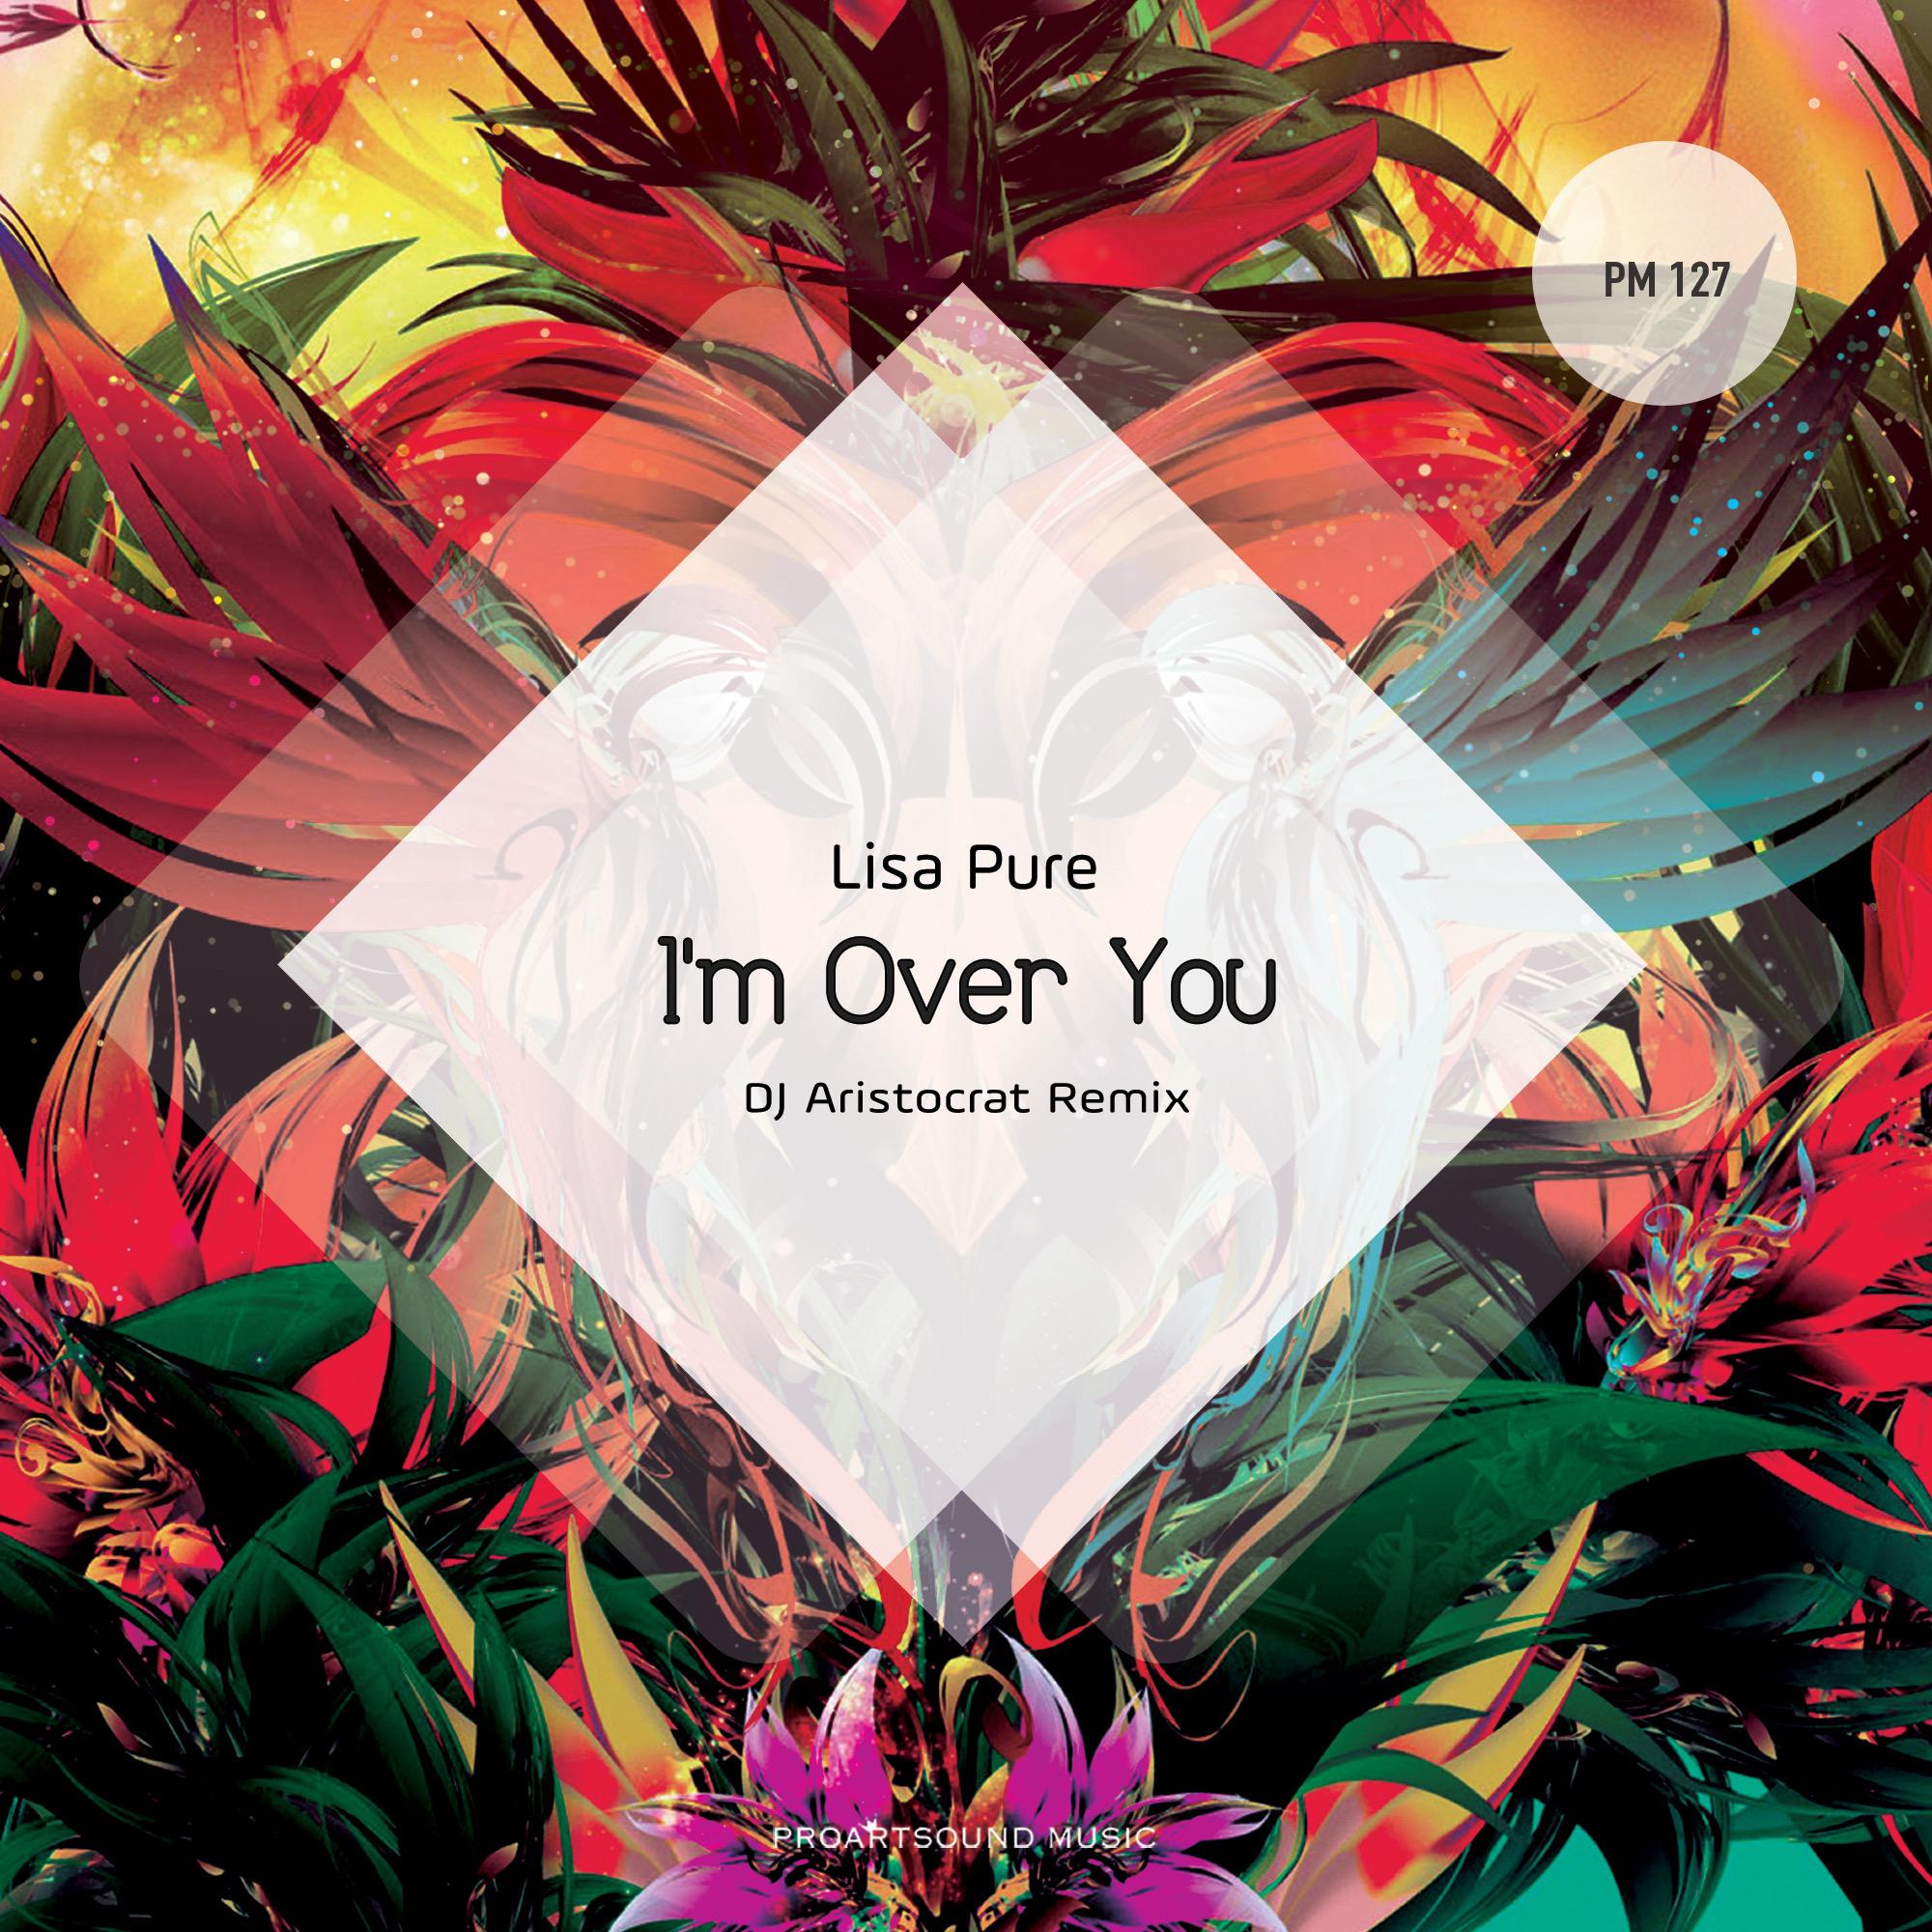 I'm Over You (DJ Aristocrat Remix) Image